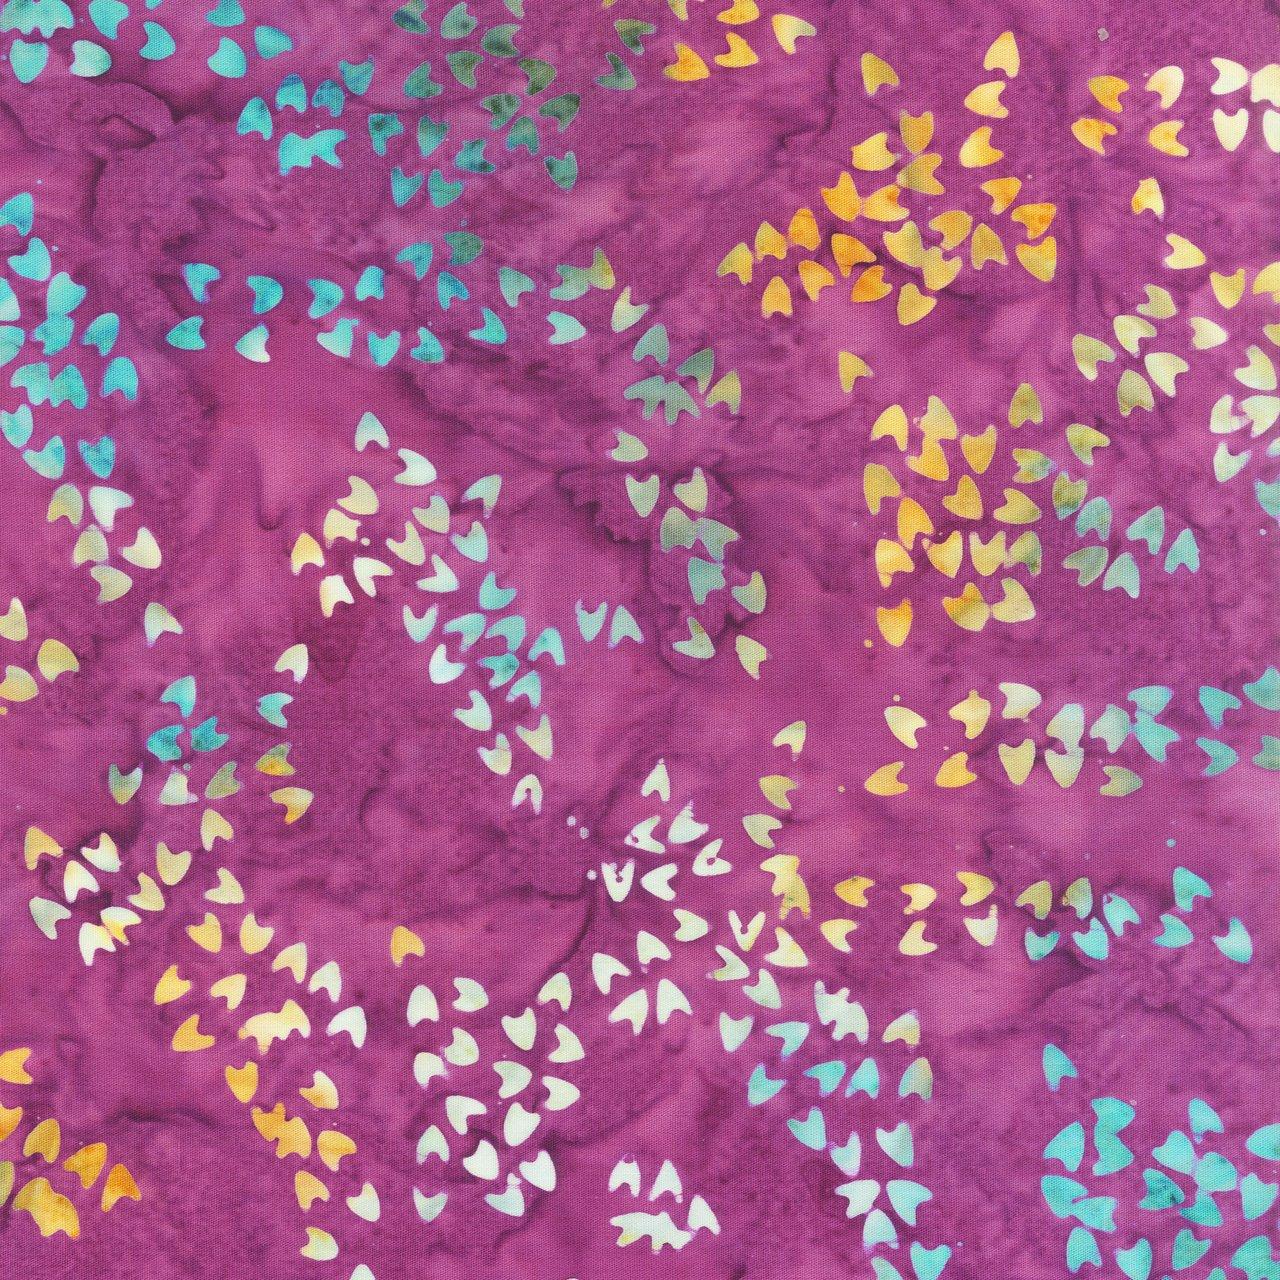 2045Q-X Art Inspired Light Iris, 1924 by Anthology Fabrics